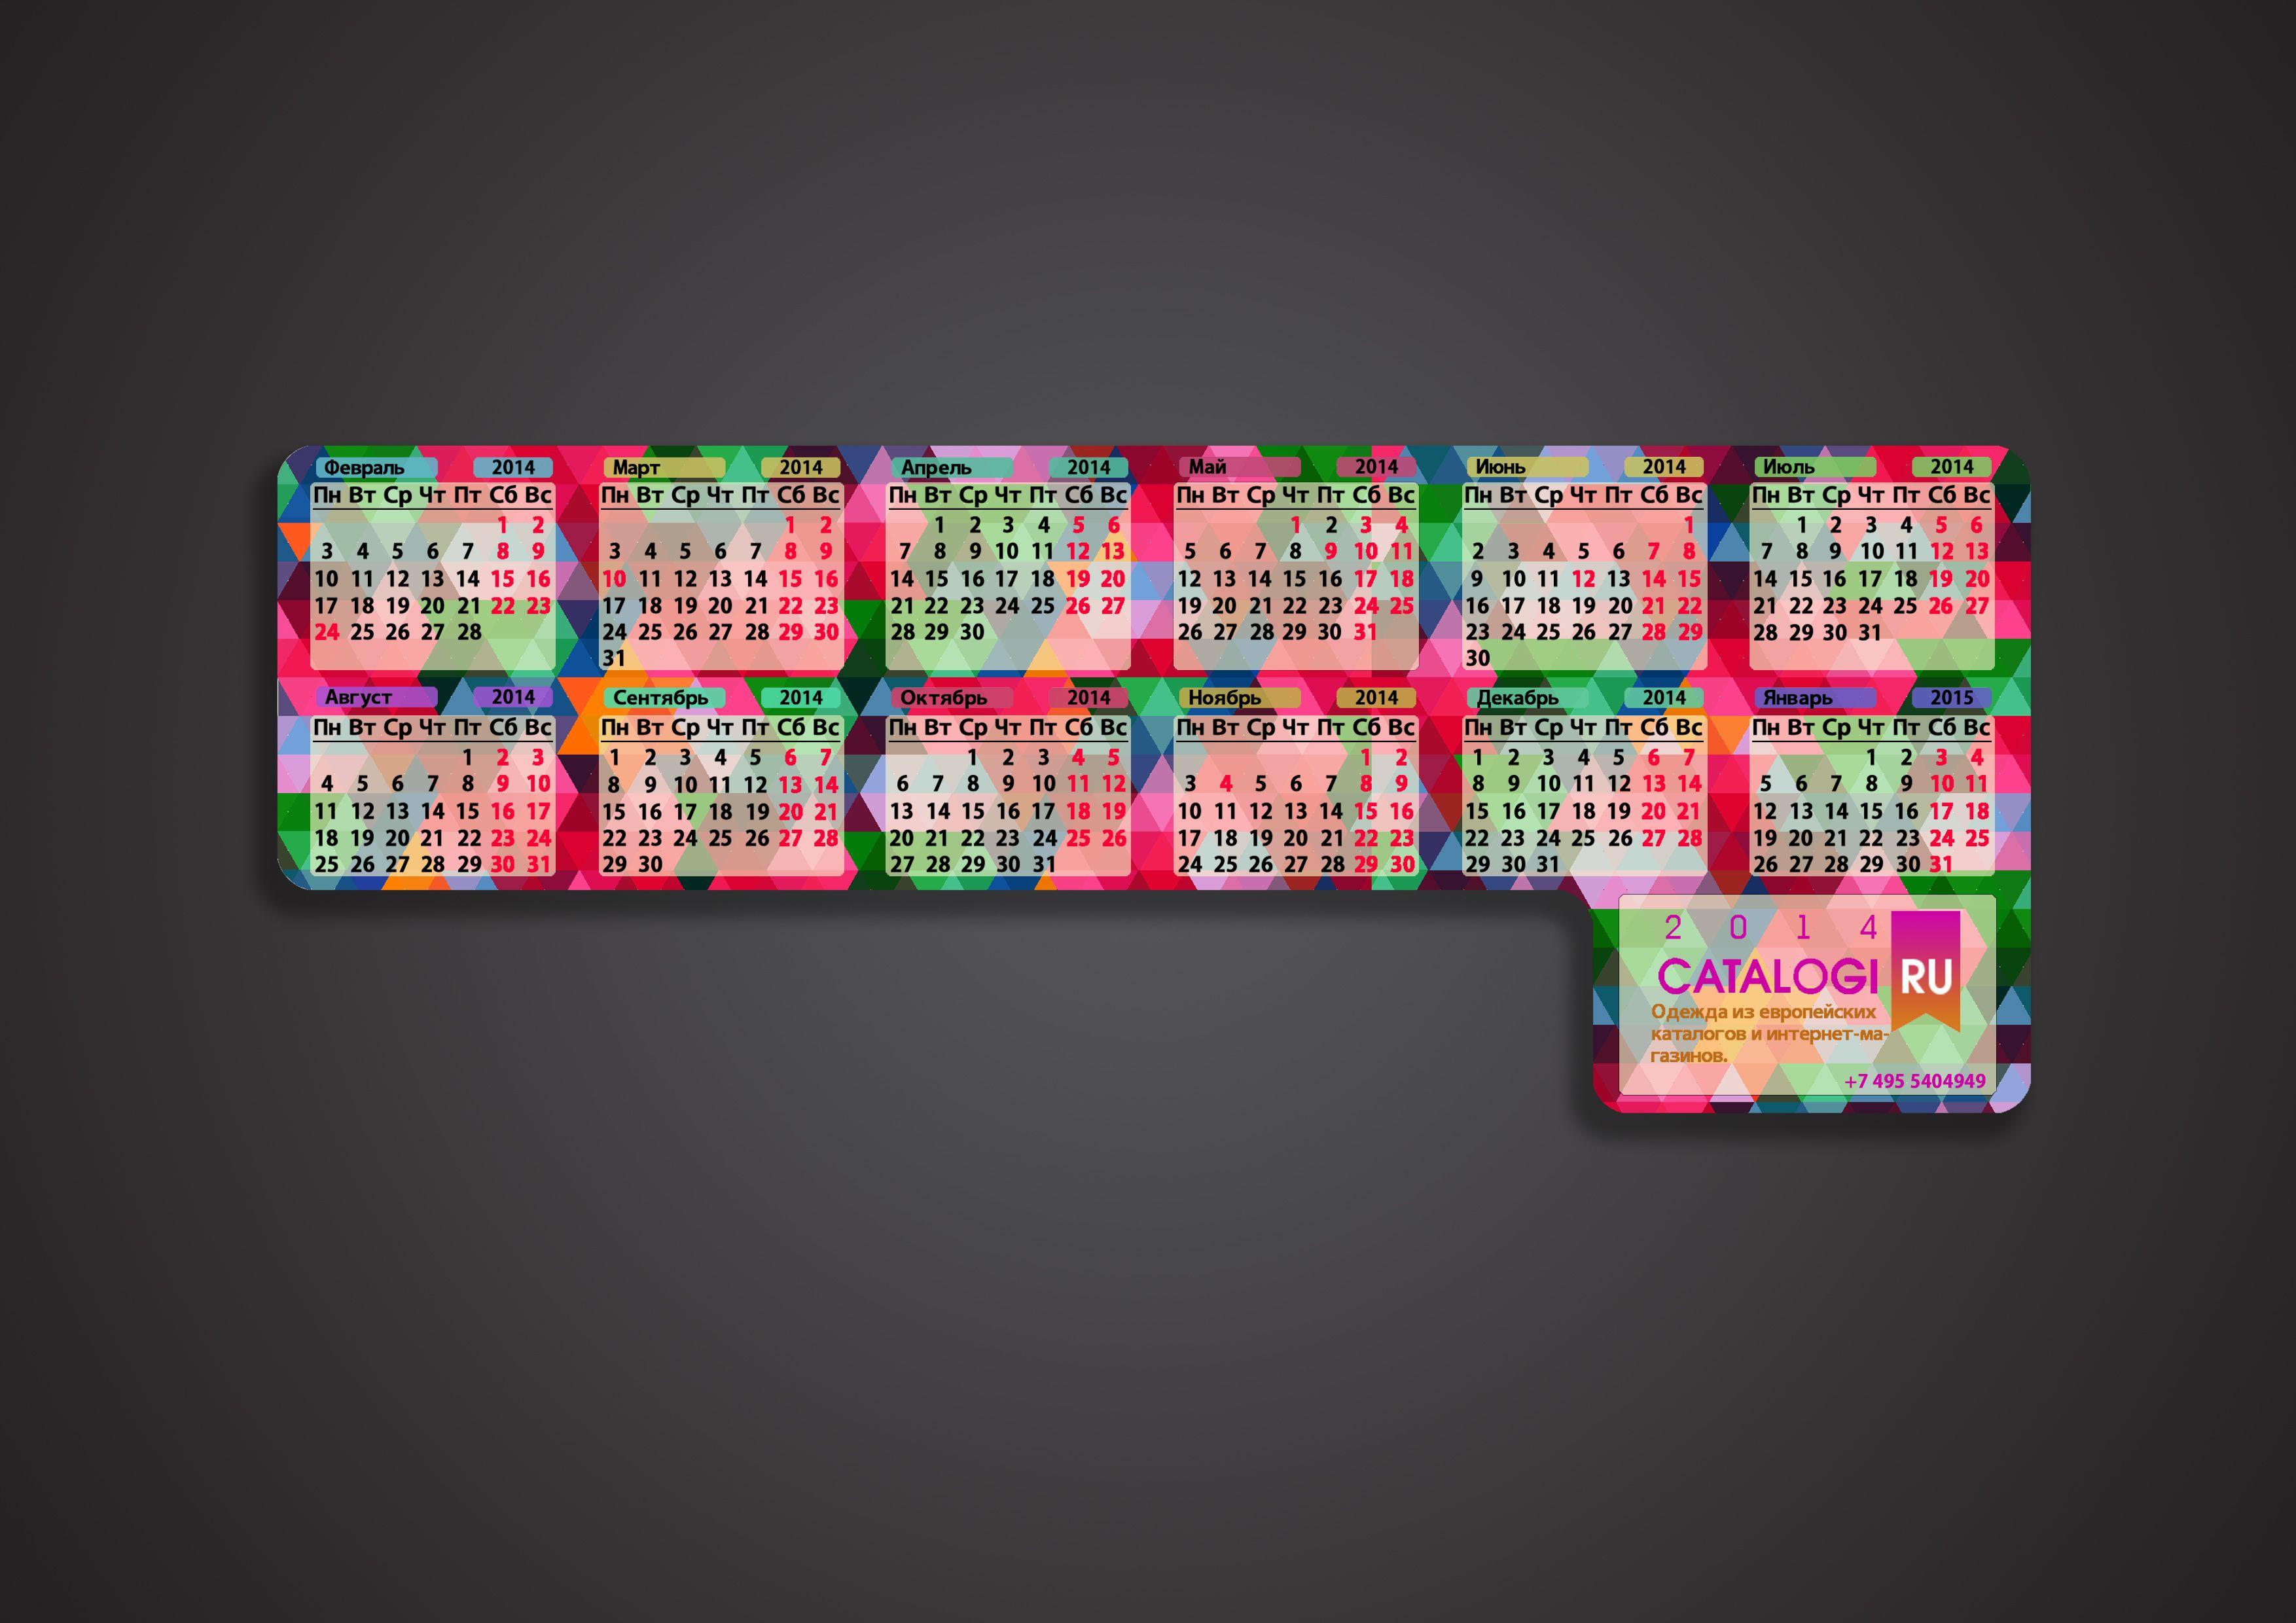 Календарик на монитор Catalogi.ru - дизайнер PenguinRockStar